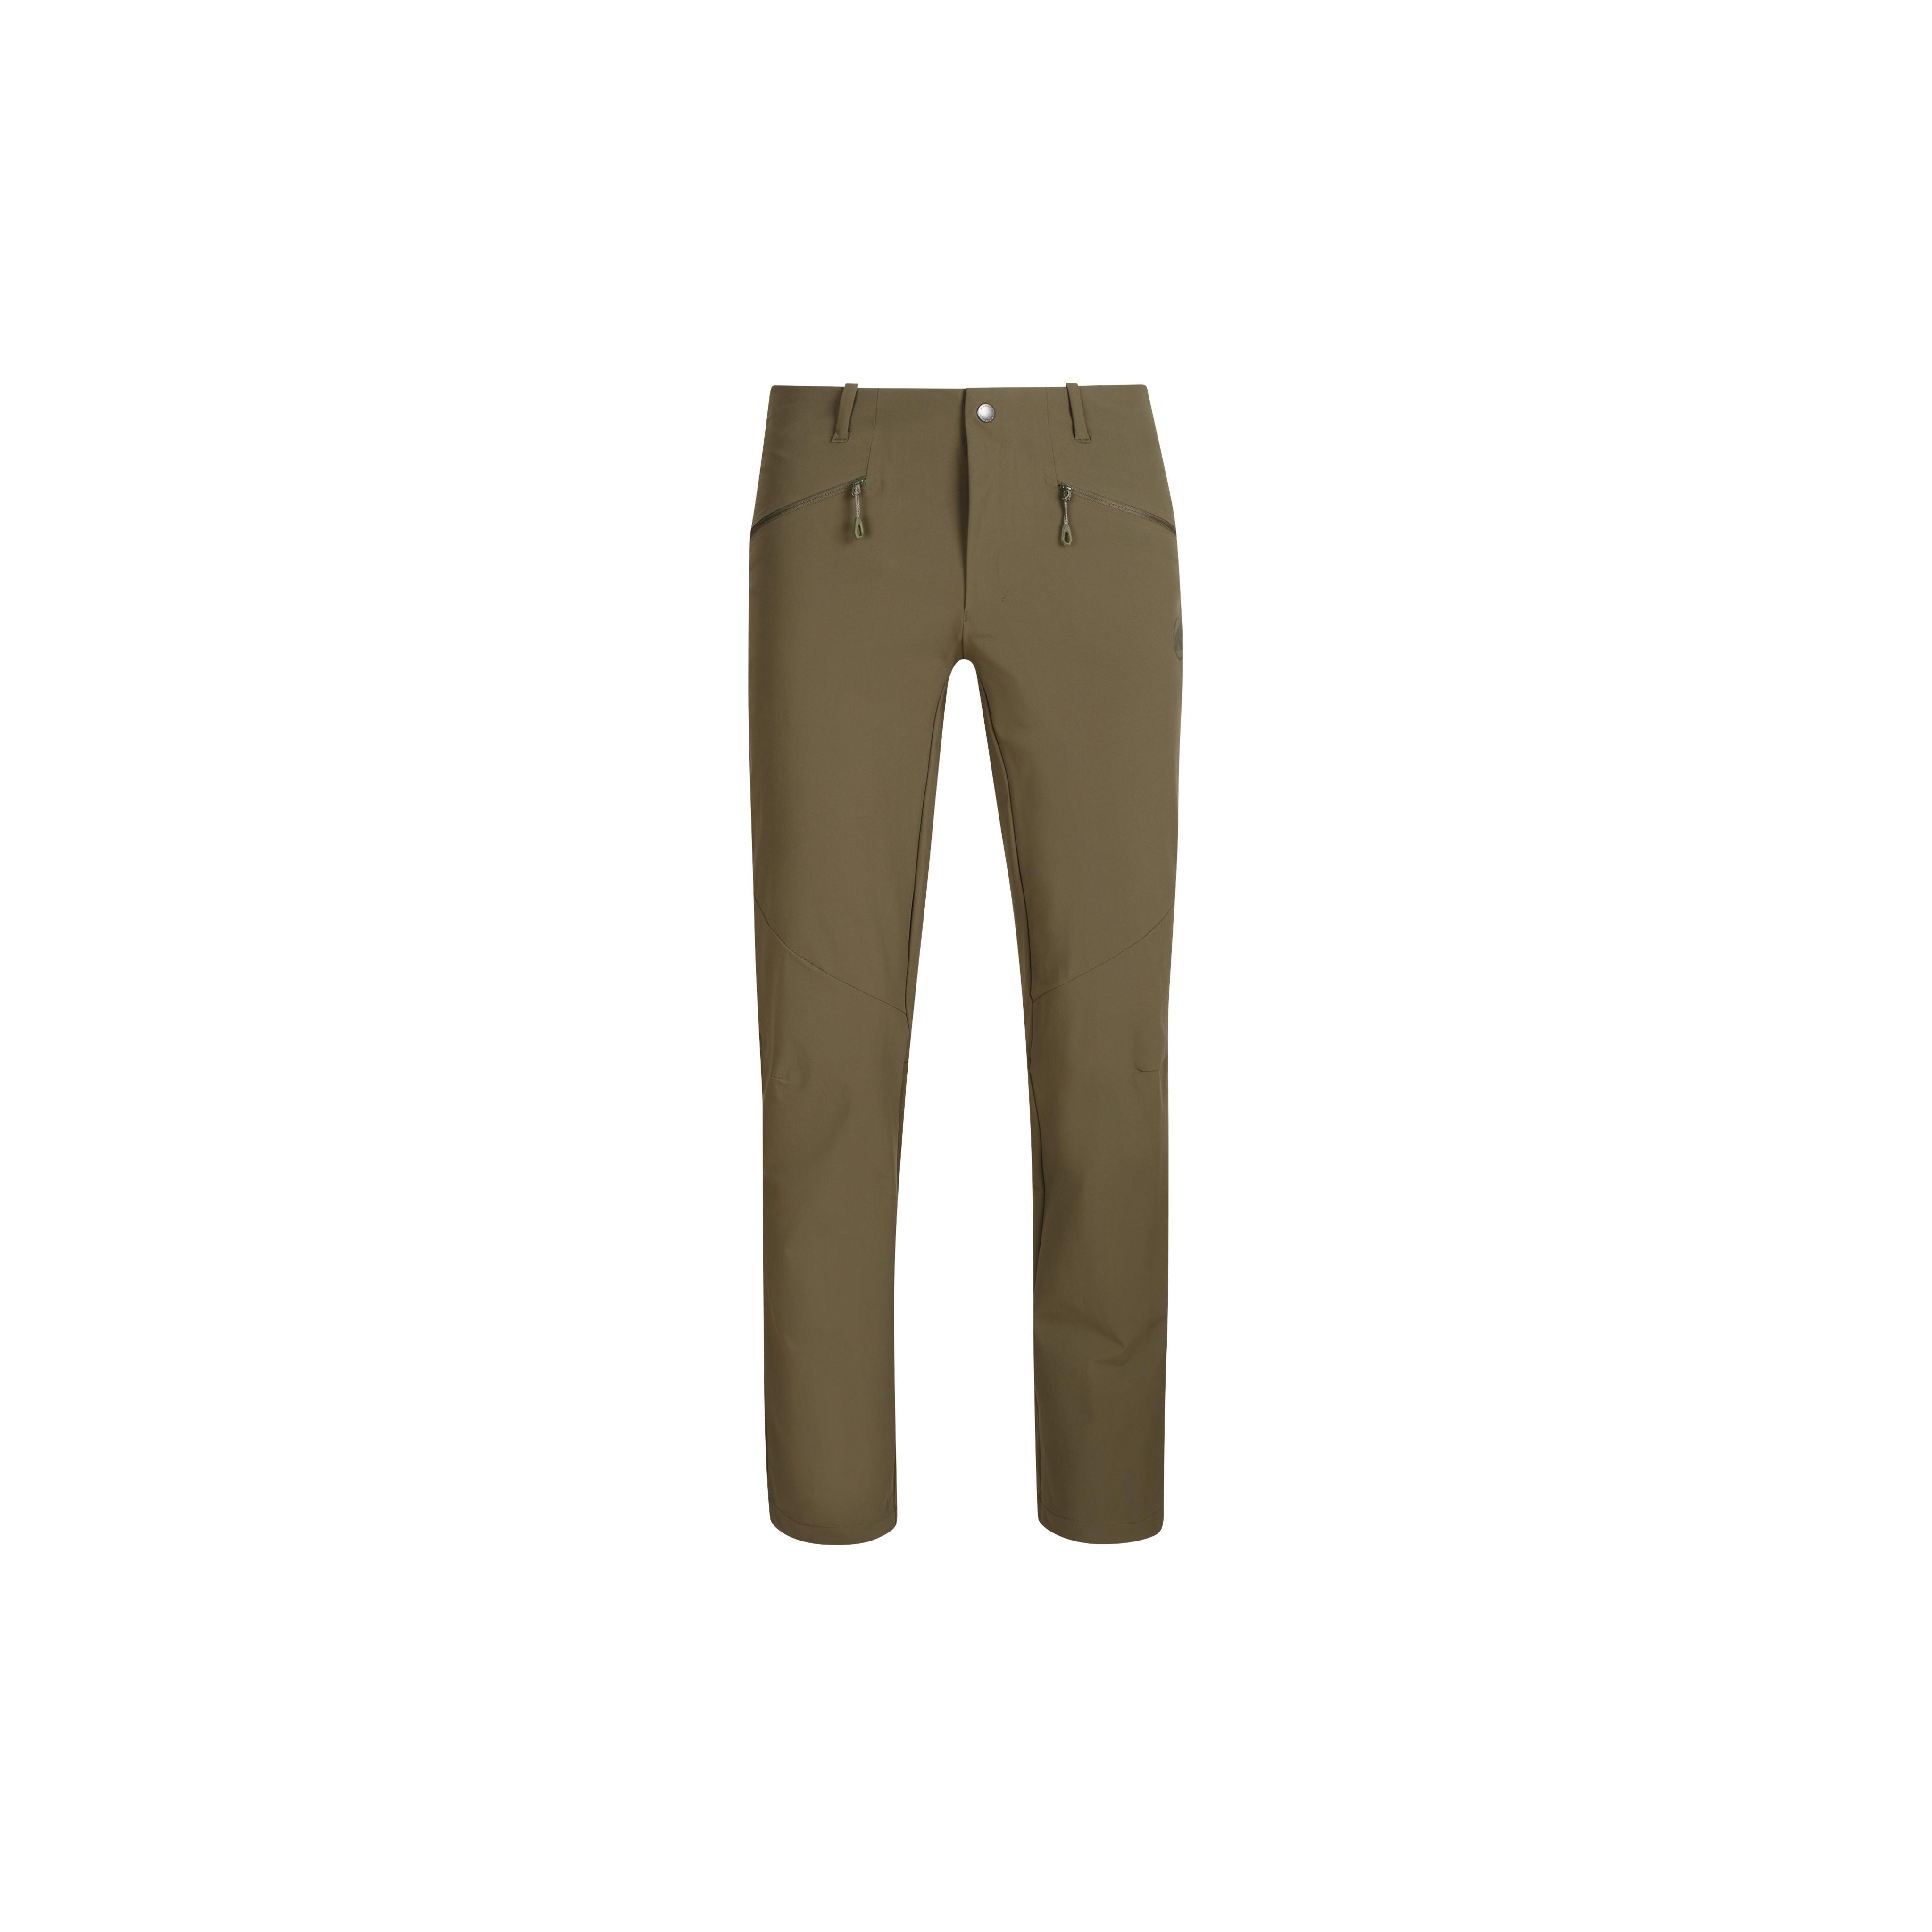 Macun SO Pants Men - iguana, normal, UK 28 thumbnail